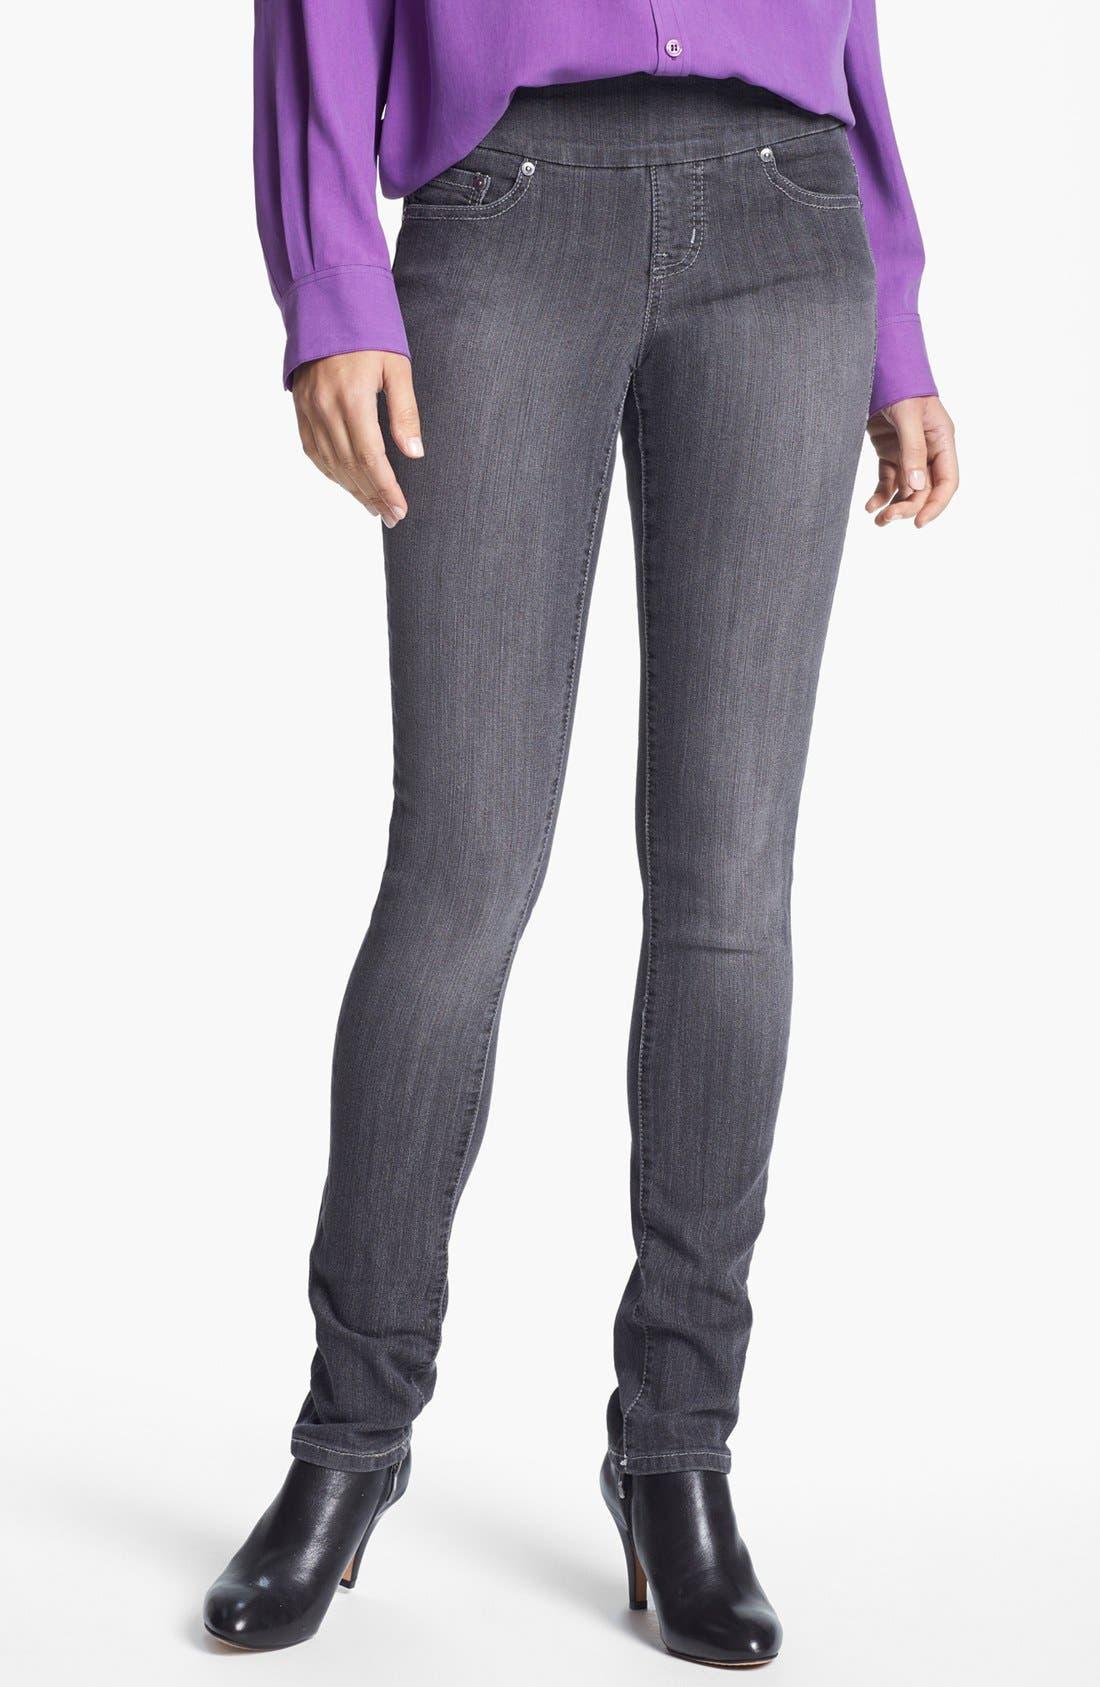 Alternate Image 1 Selected - Jag Jeans 'Malia' Slim Leg Stretch Jeans (Grey) (Petite)